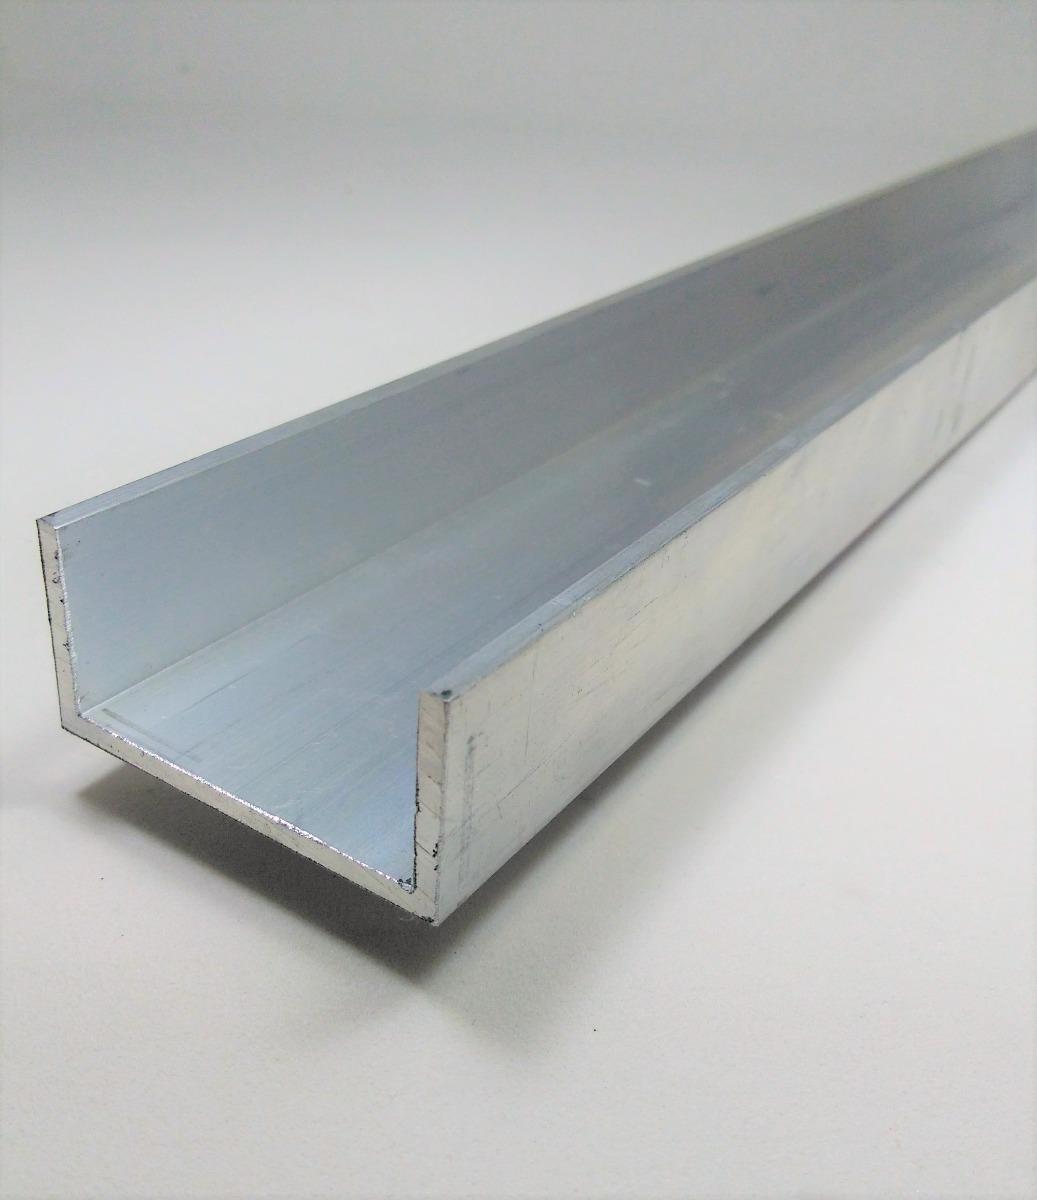 Perfil u aluminio 1x2x1x1 8 2 54cmx5 08cmx2 54cmx3 17mm for Perfiles de aluminio para toldos de palilleria